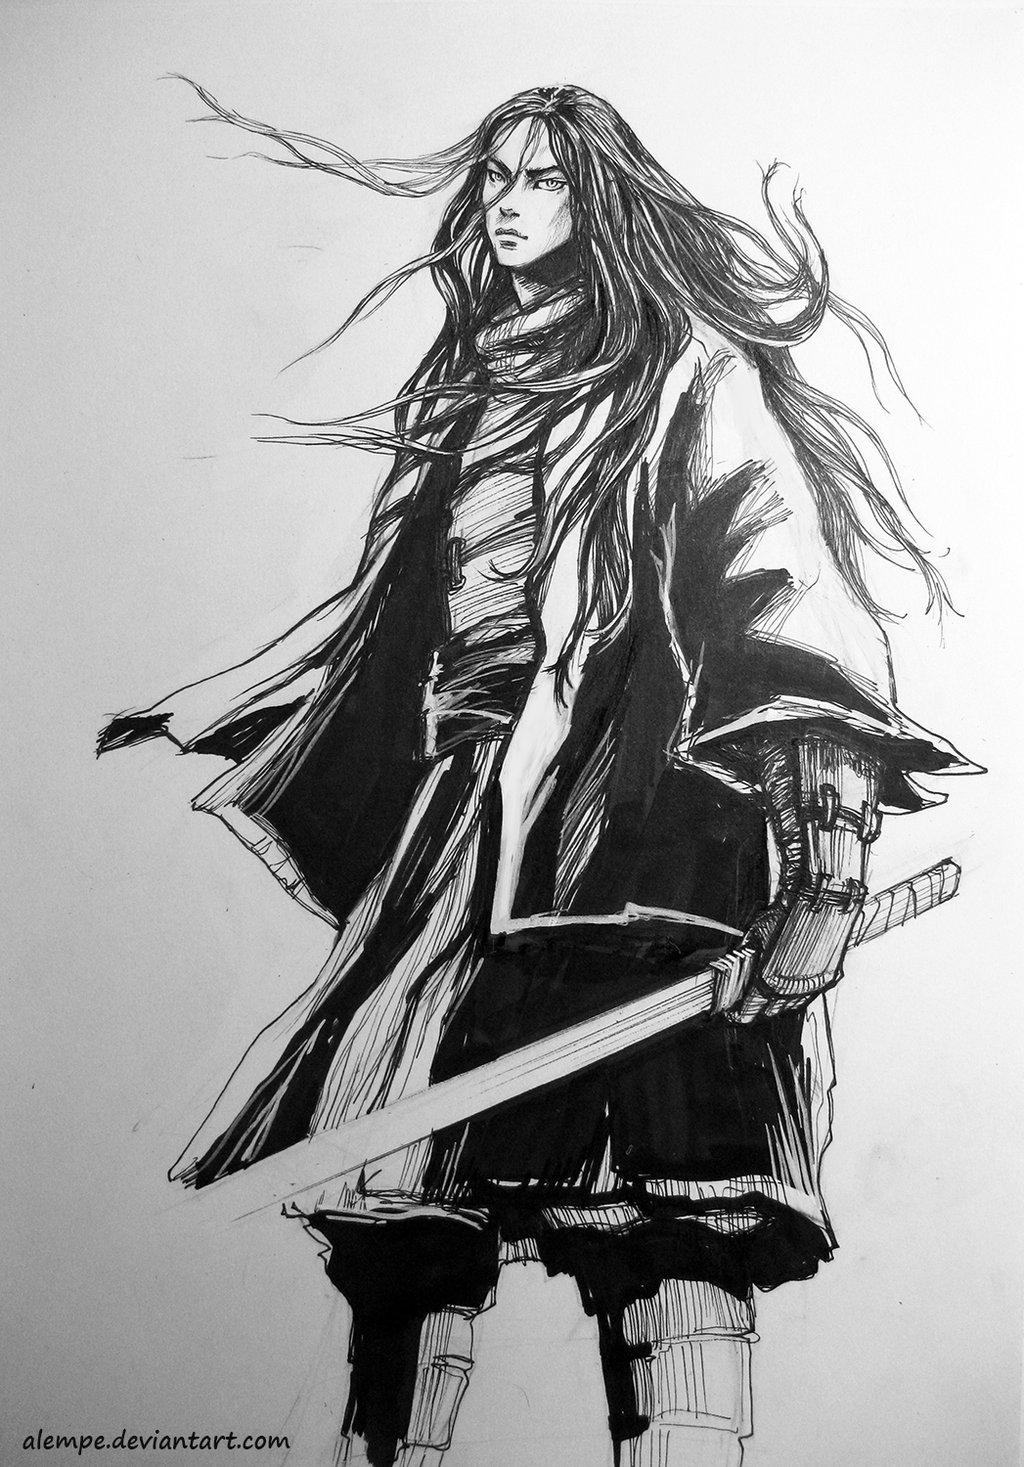 Drawn warrior shaman Shaman alempe by  DeviantArt